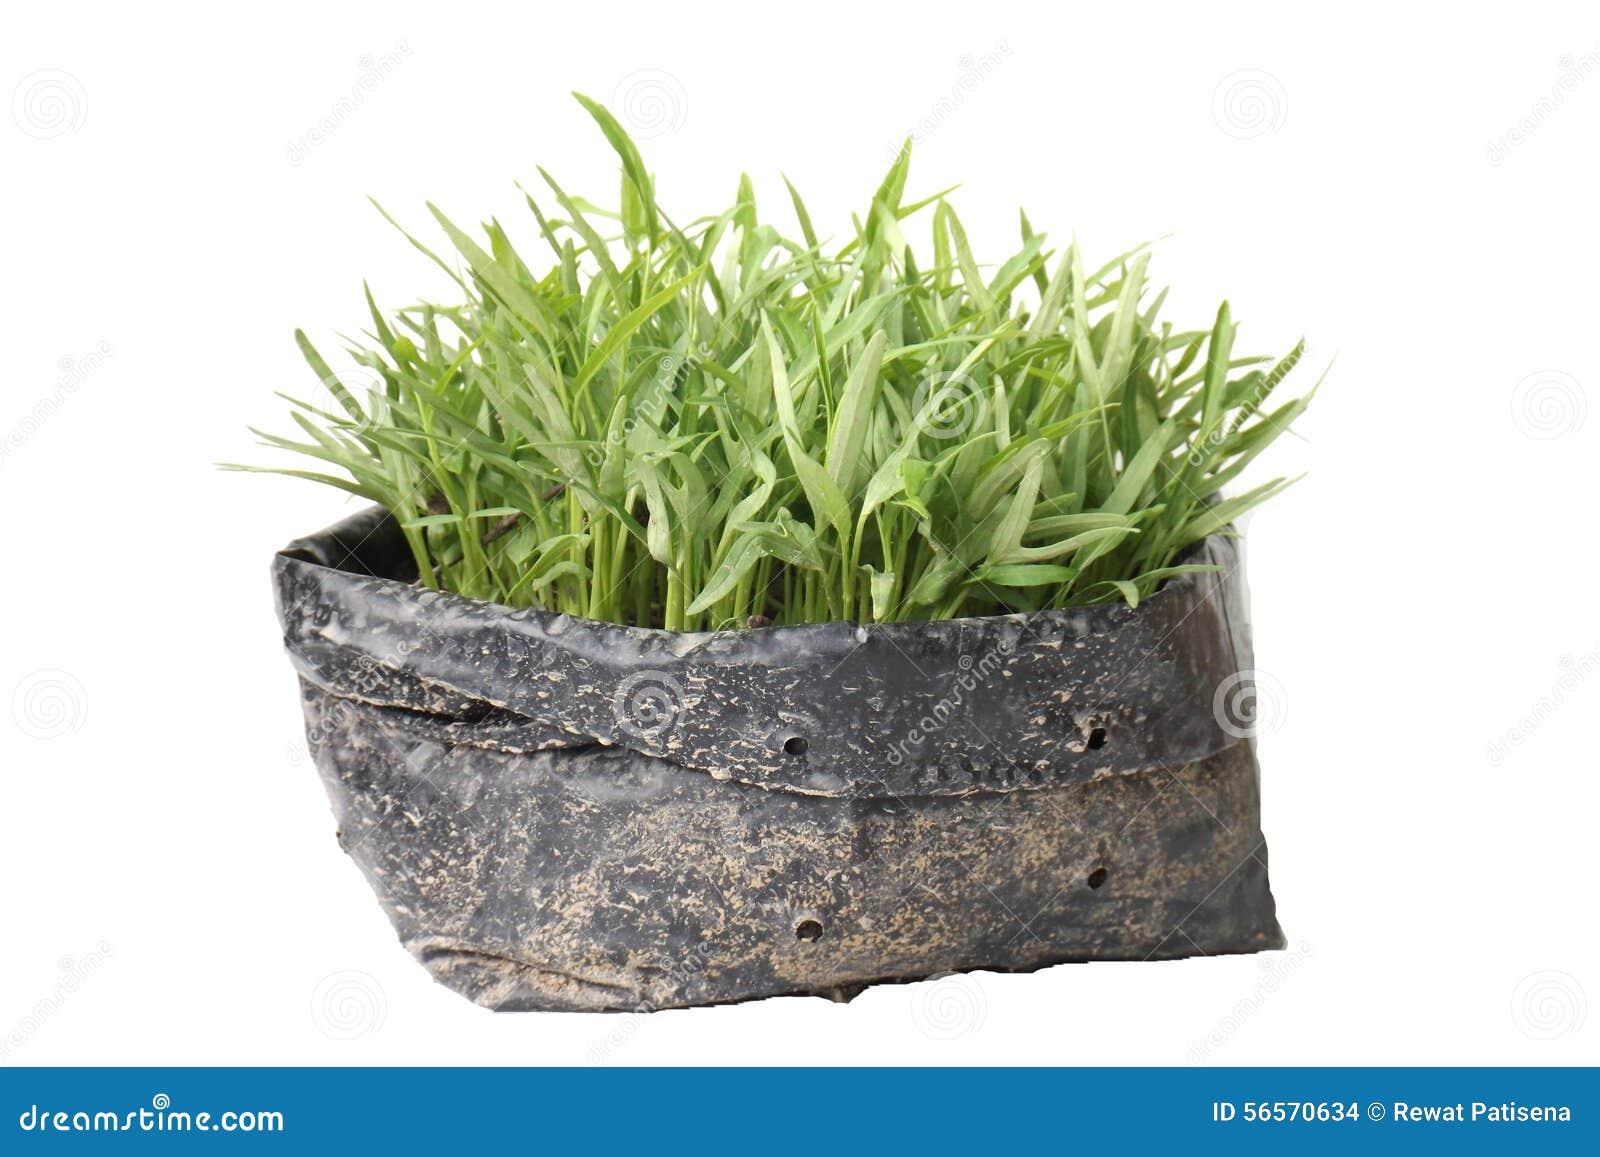 Download Δόξα πρωινού σποροφύτων σε μια τσάντα κήπων Στοκ Εικόνες - εικόνα από φύλλωμα, φυτικός: 56570634